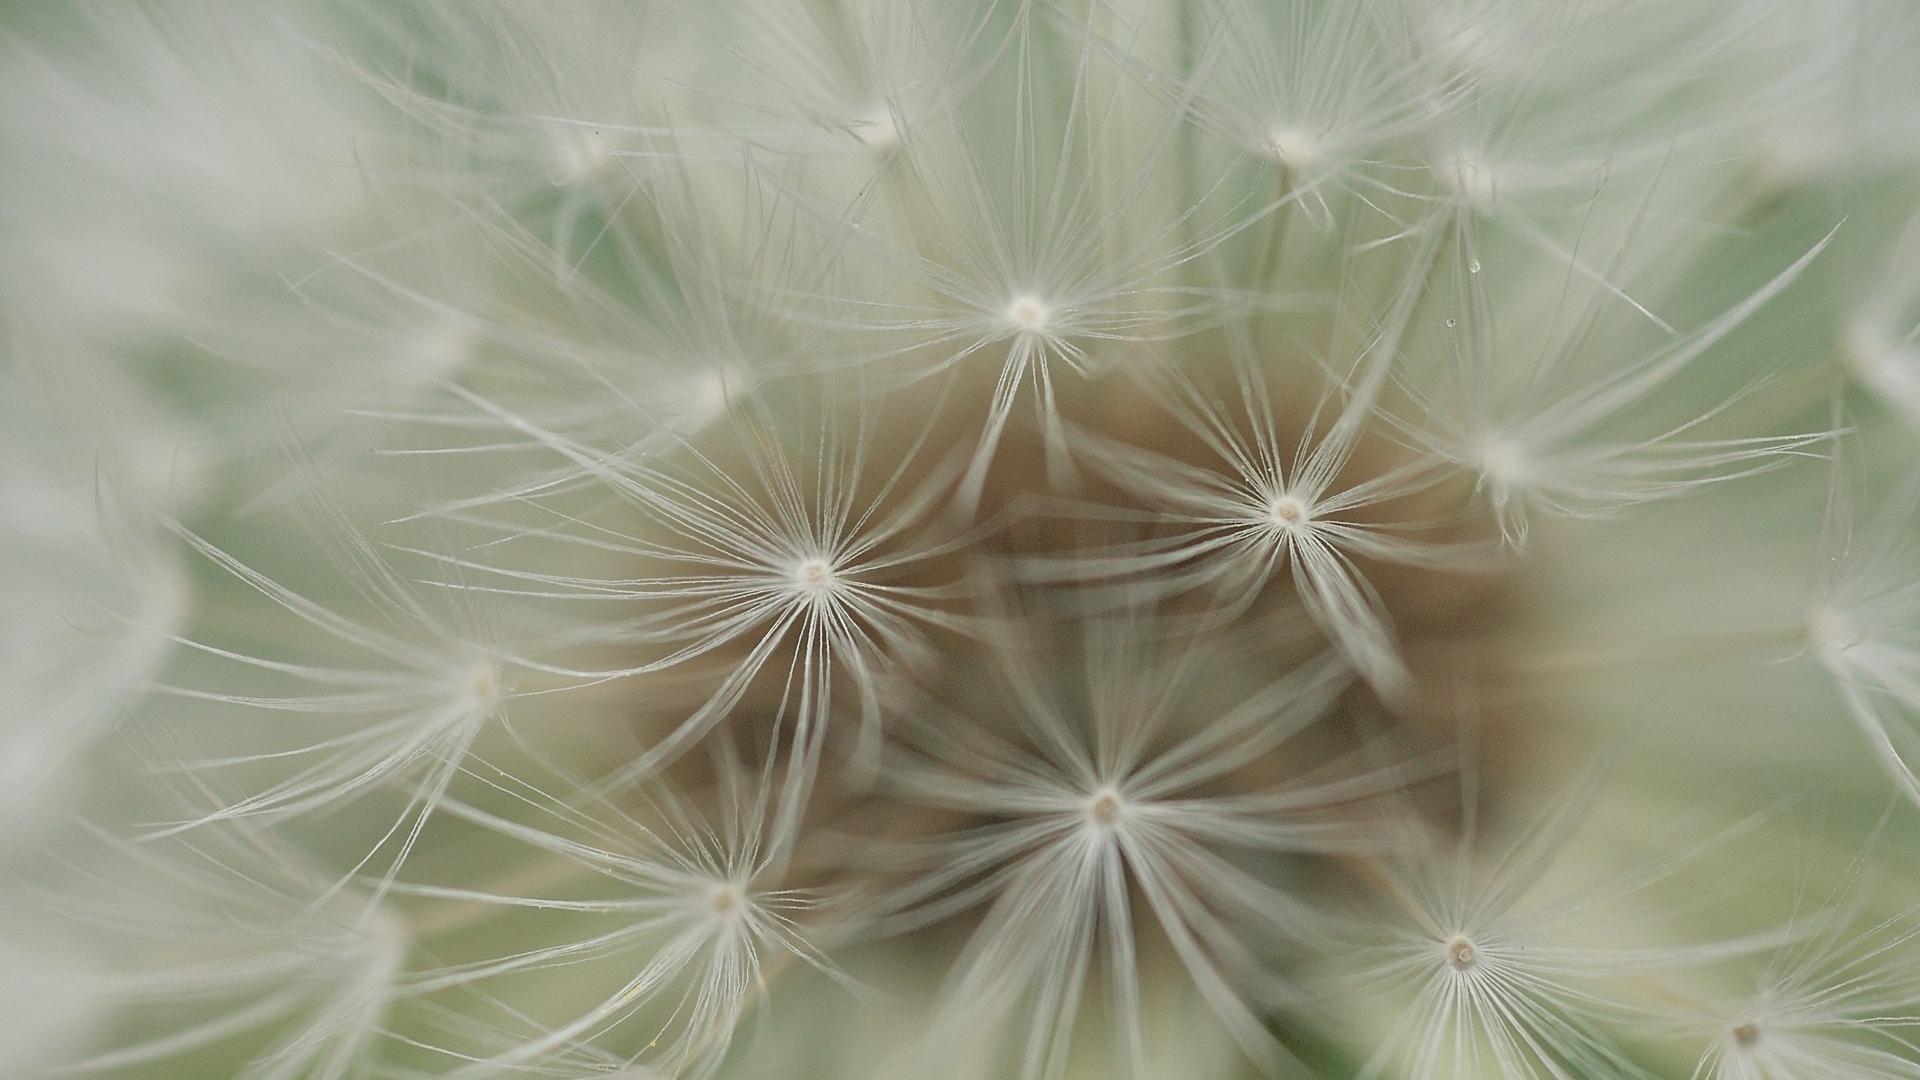 Download wallpaper 1920x1080 dandelion plants feathers - Dandelion hd wallpapers 1080p ...